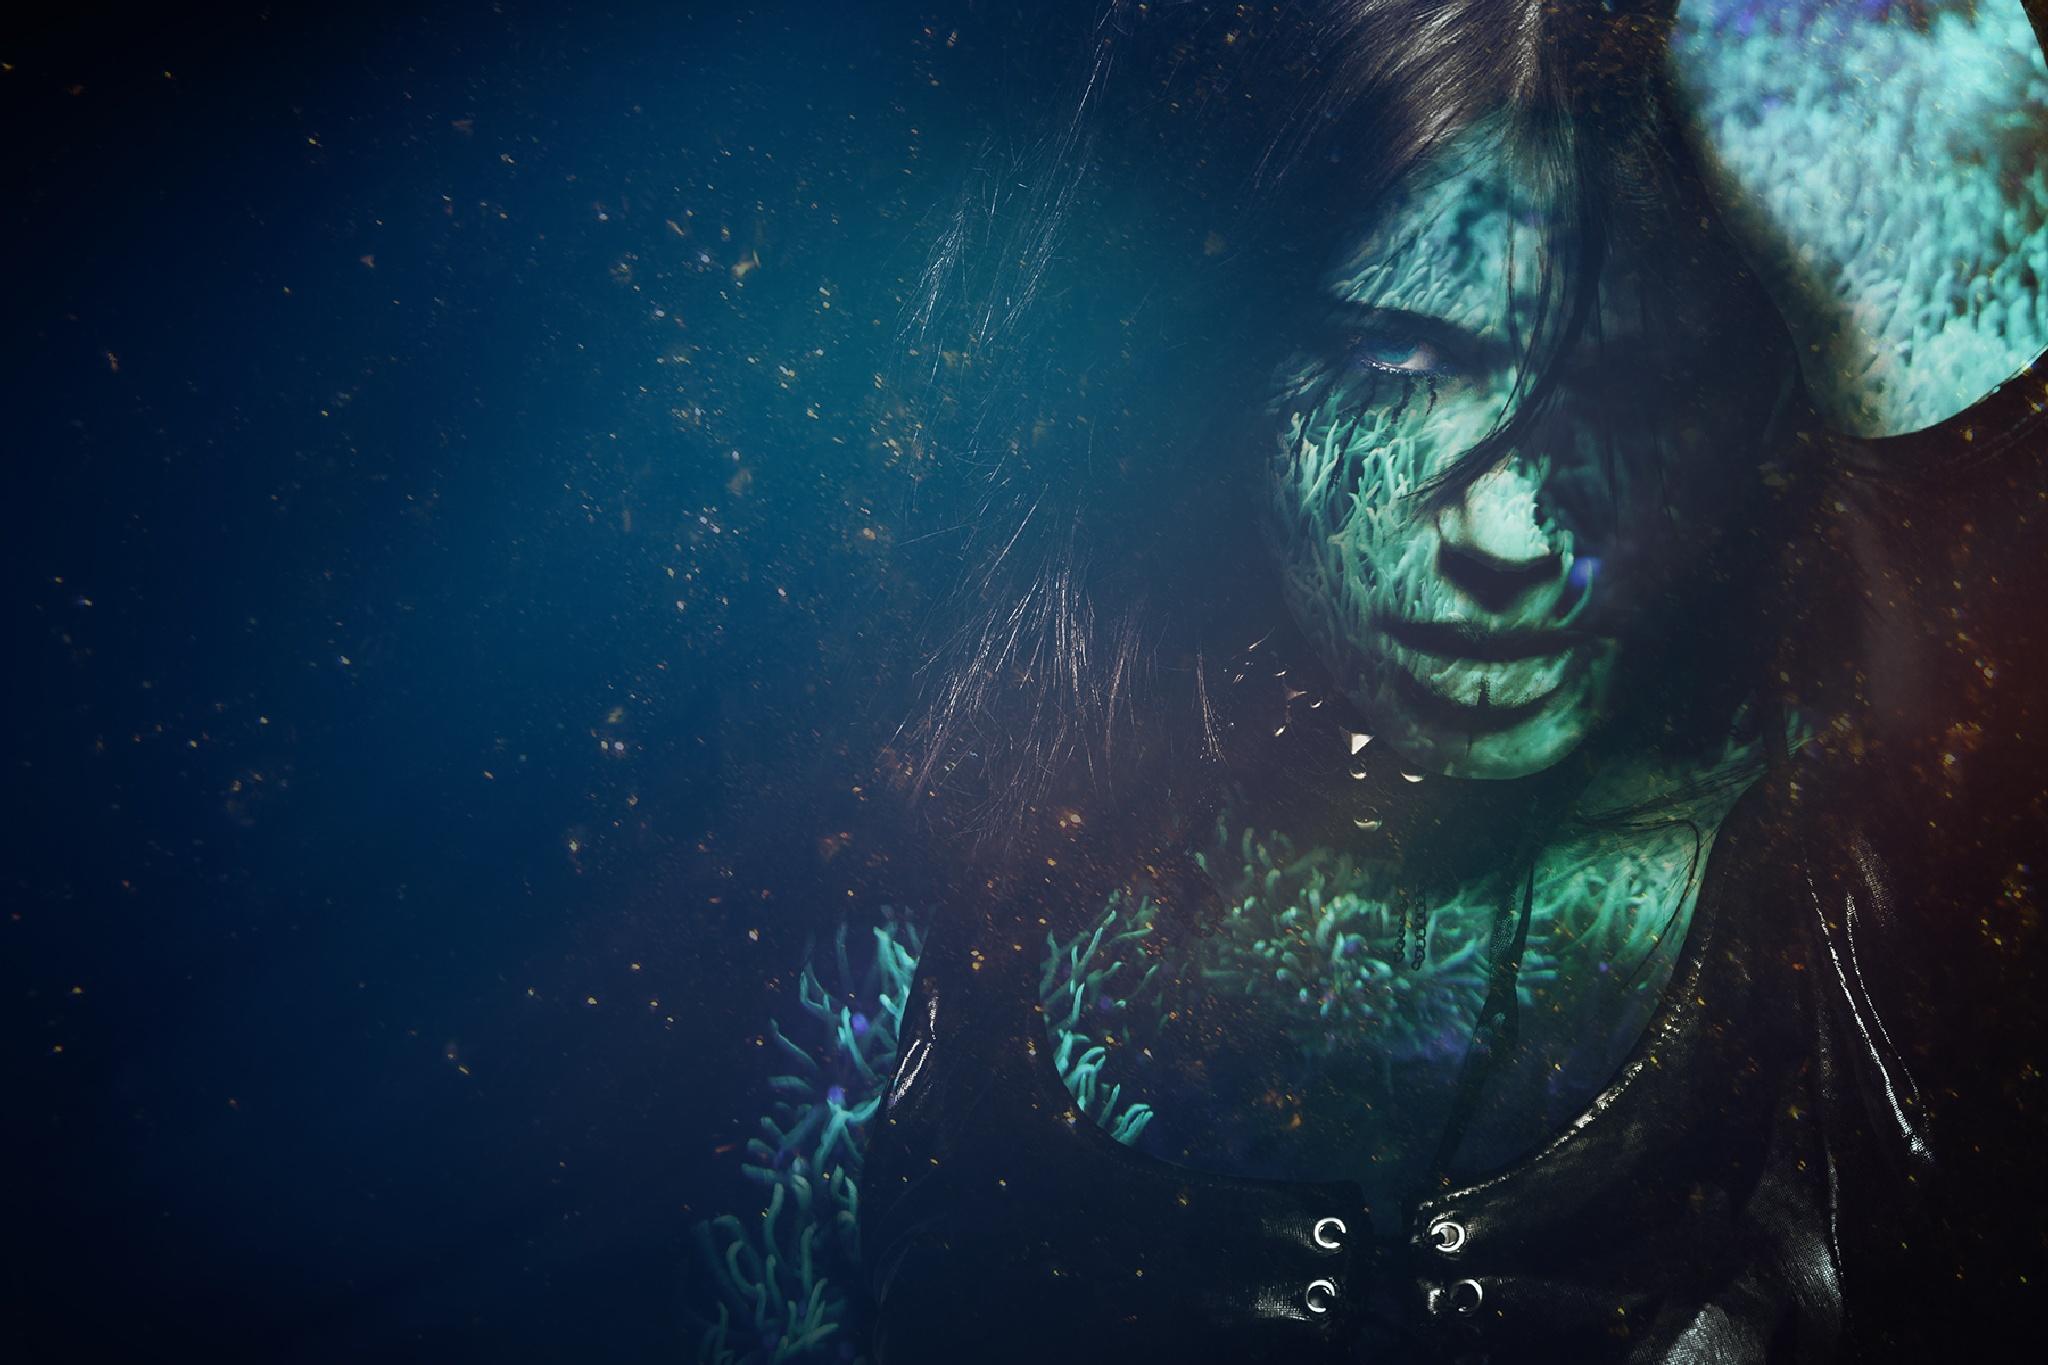 Prisma by Unholy Beauty Fotodesign